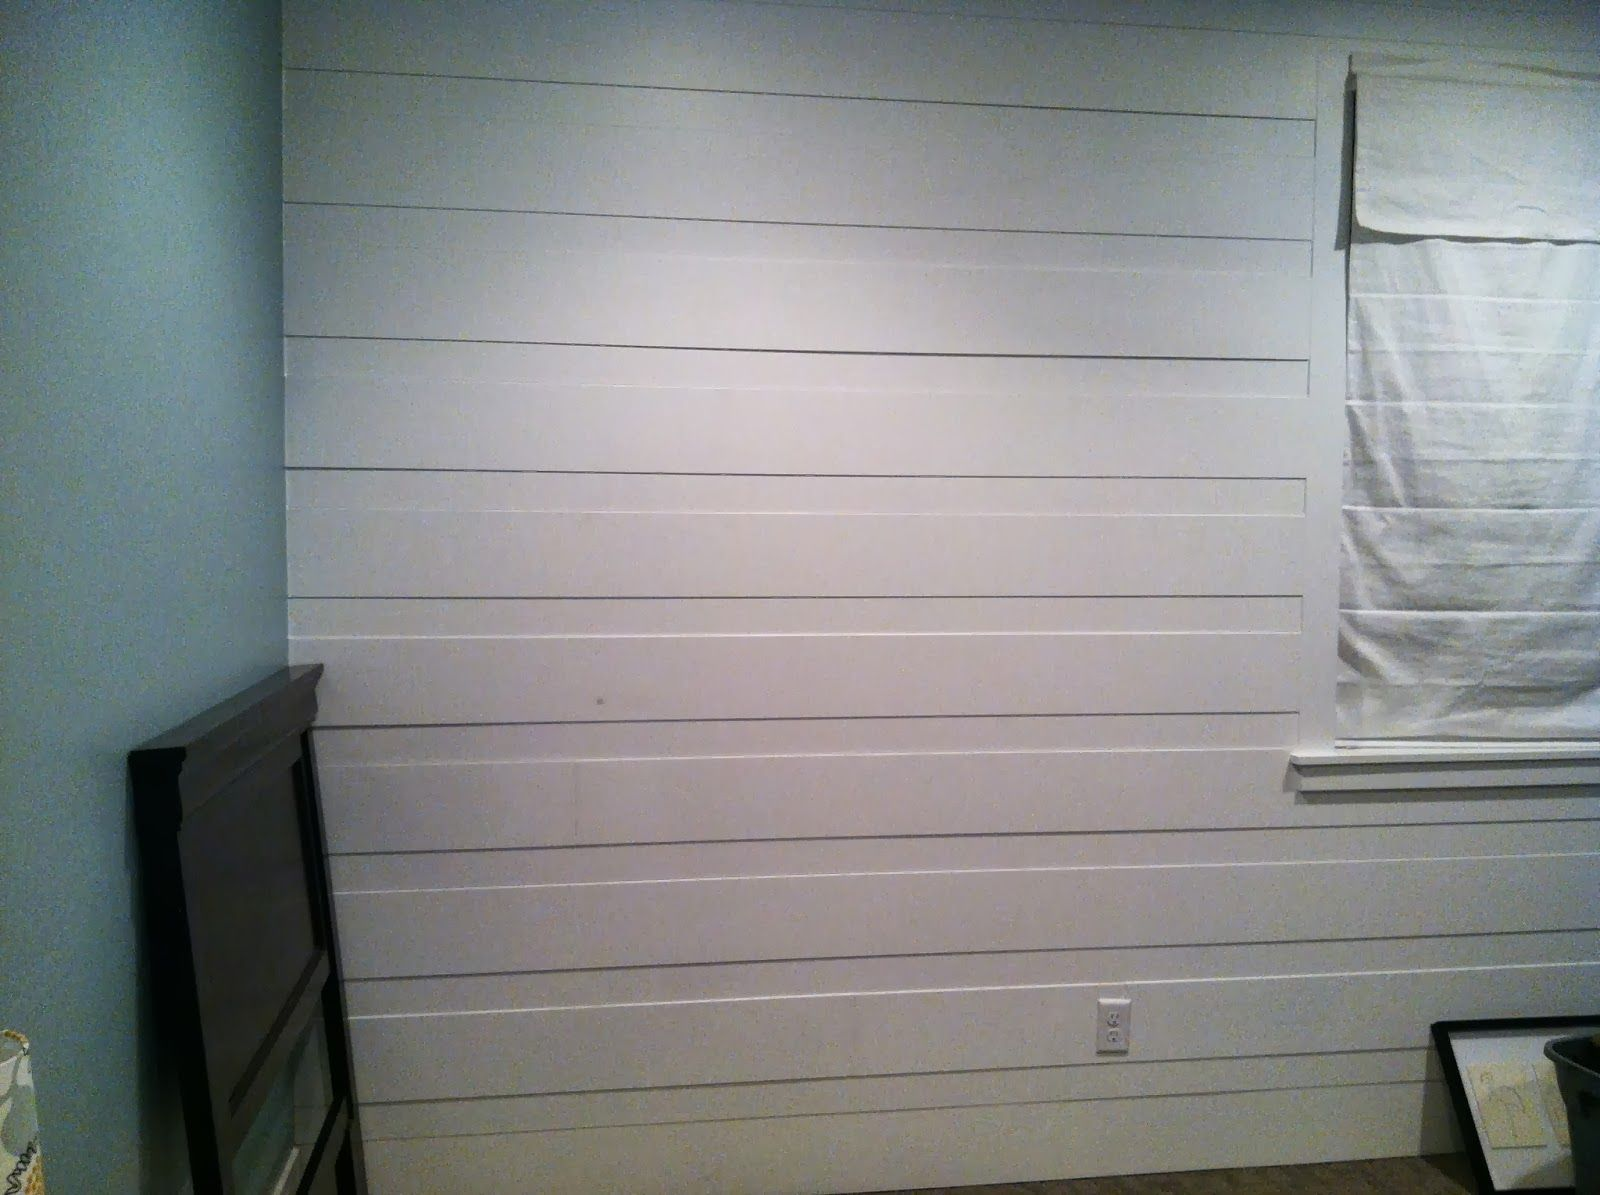 A Saltbox Shiplap Siding Wall Paneling Ideas Pinterest Shiplap Siding Paneling Ideas And